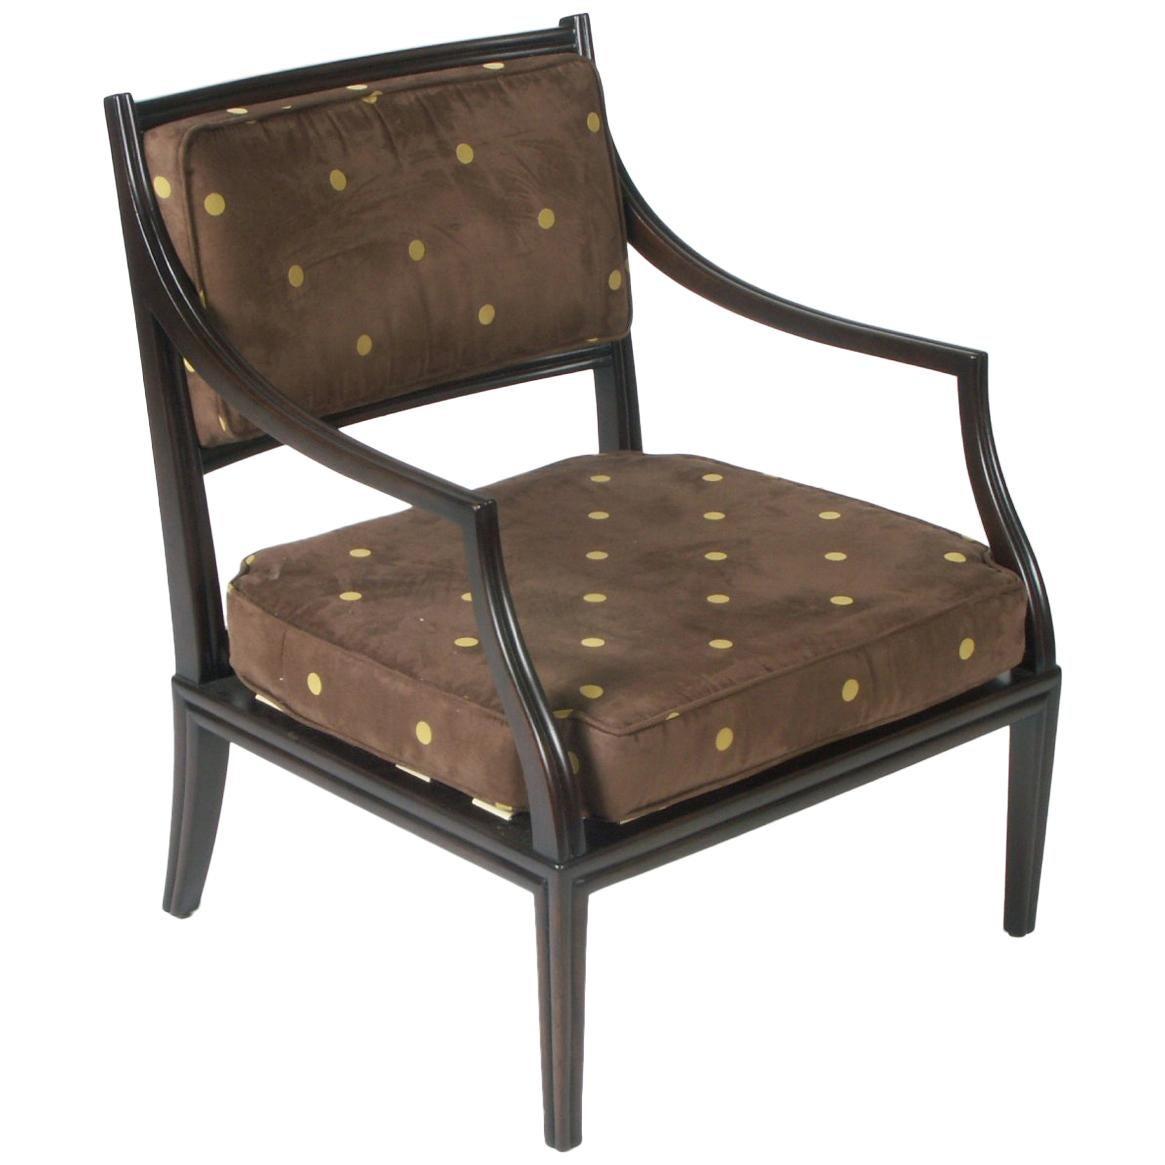 Rare and Elegant Edward Wormley for Dunbar Lounge Armchair